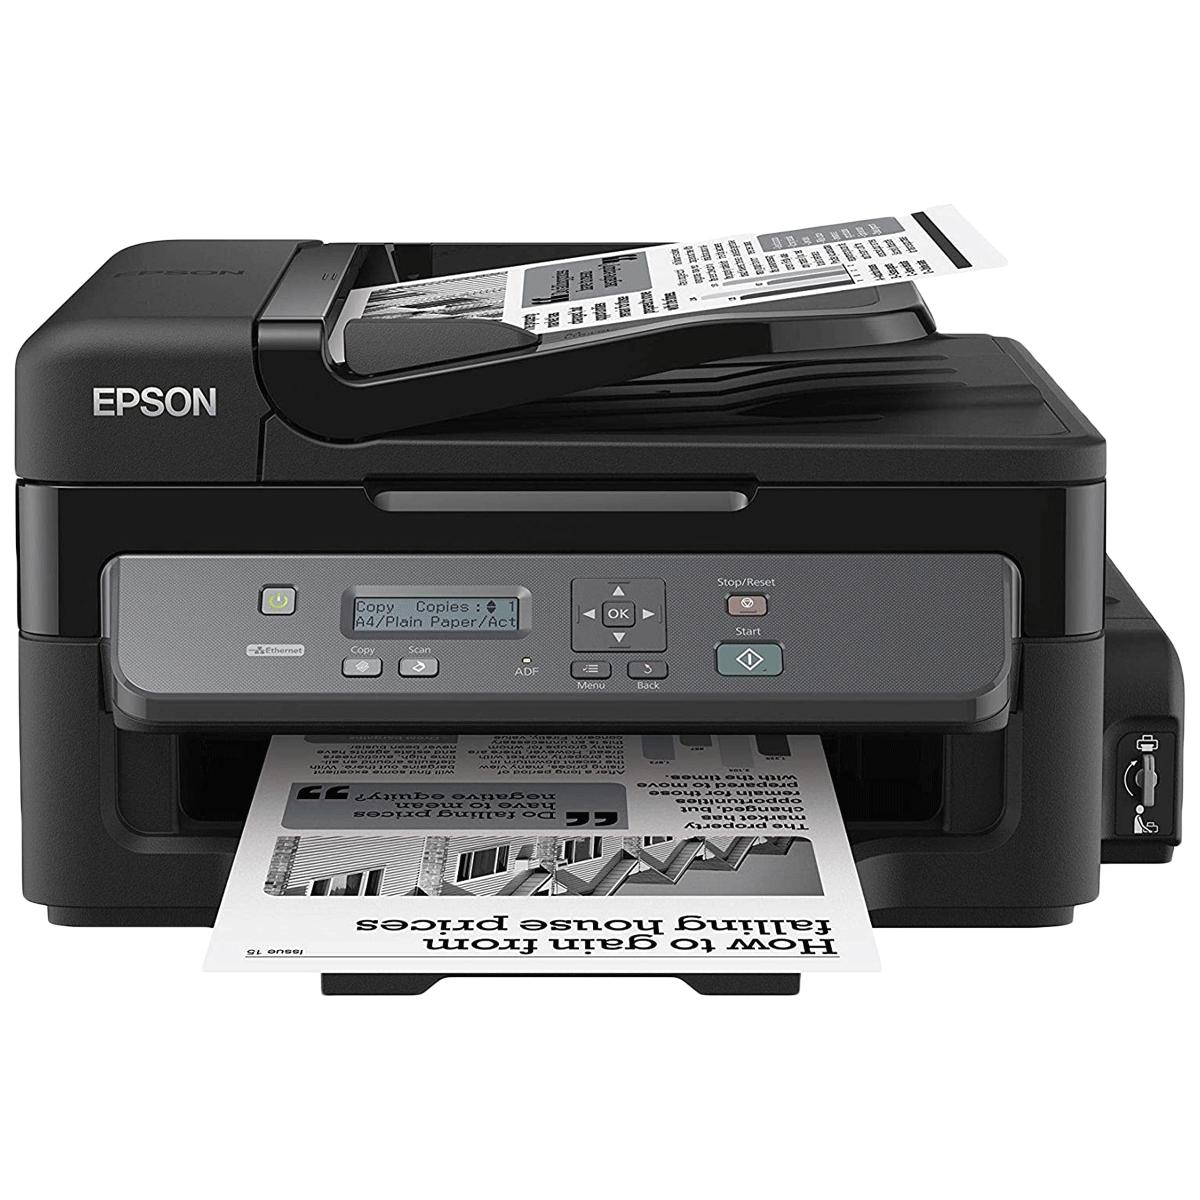 Epson EcoTank Wireless Black & White Multi-Function Inkjet Printer (Mobile Printing, M205, Black)_1